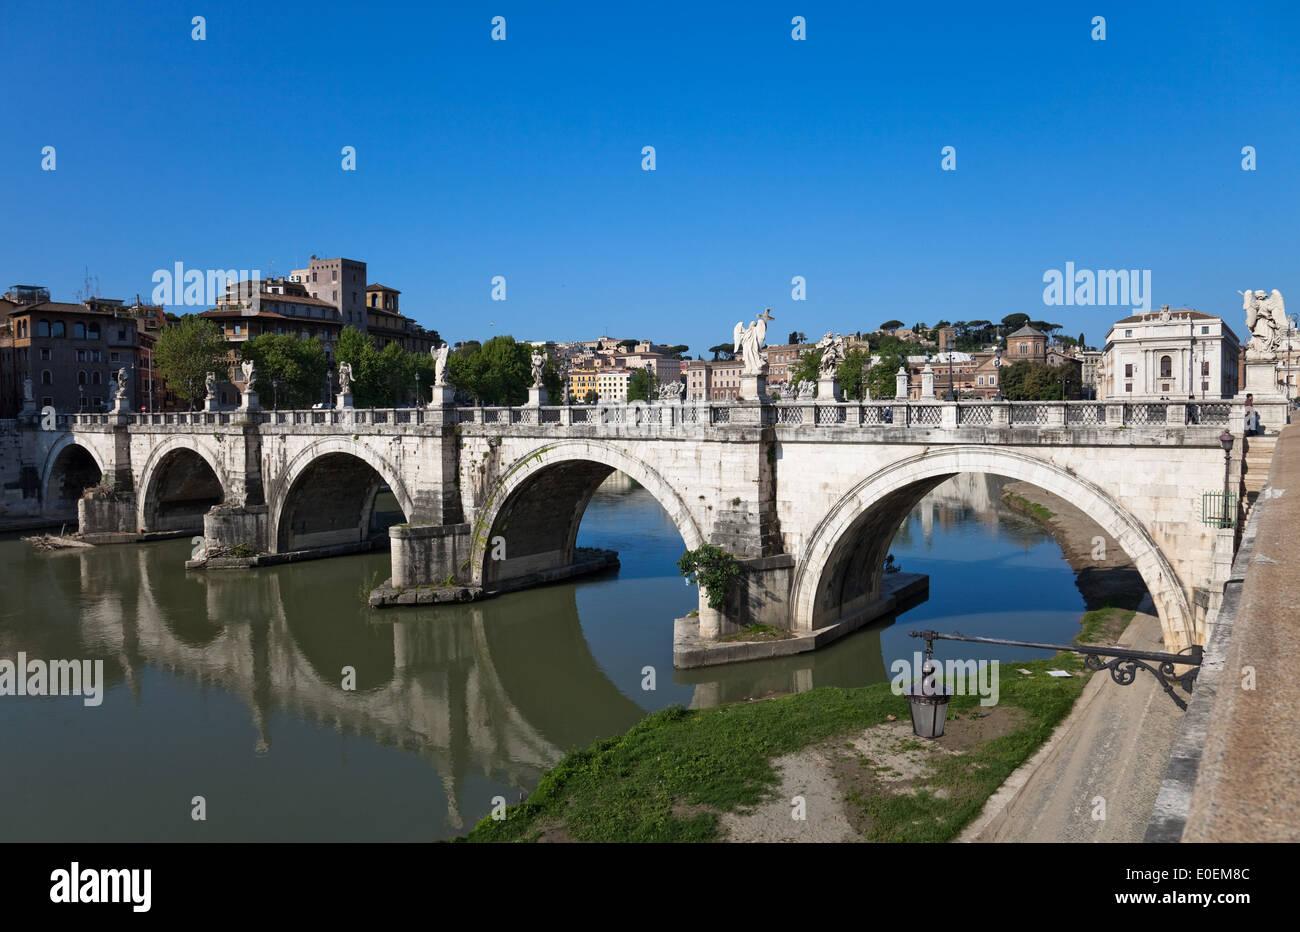 Engelsbrücke, Rom, Italien - Bridge of Angels, Rome, Italy Stock Photo